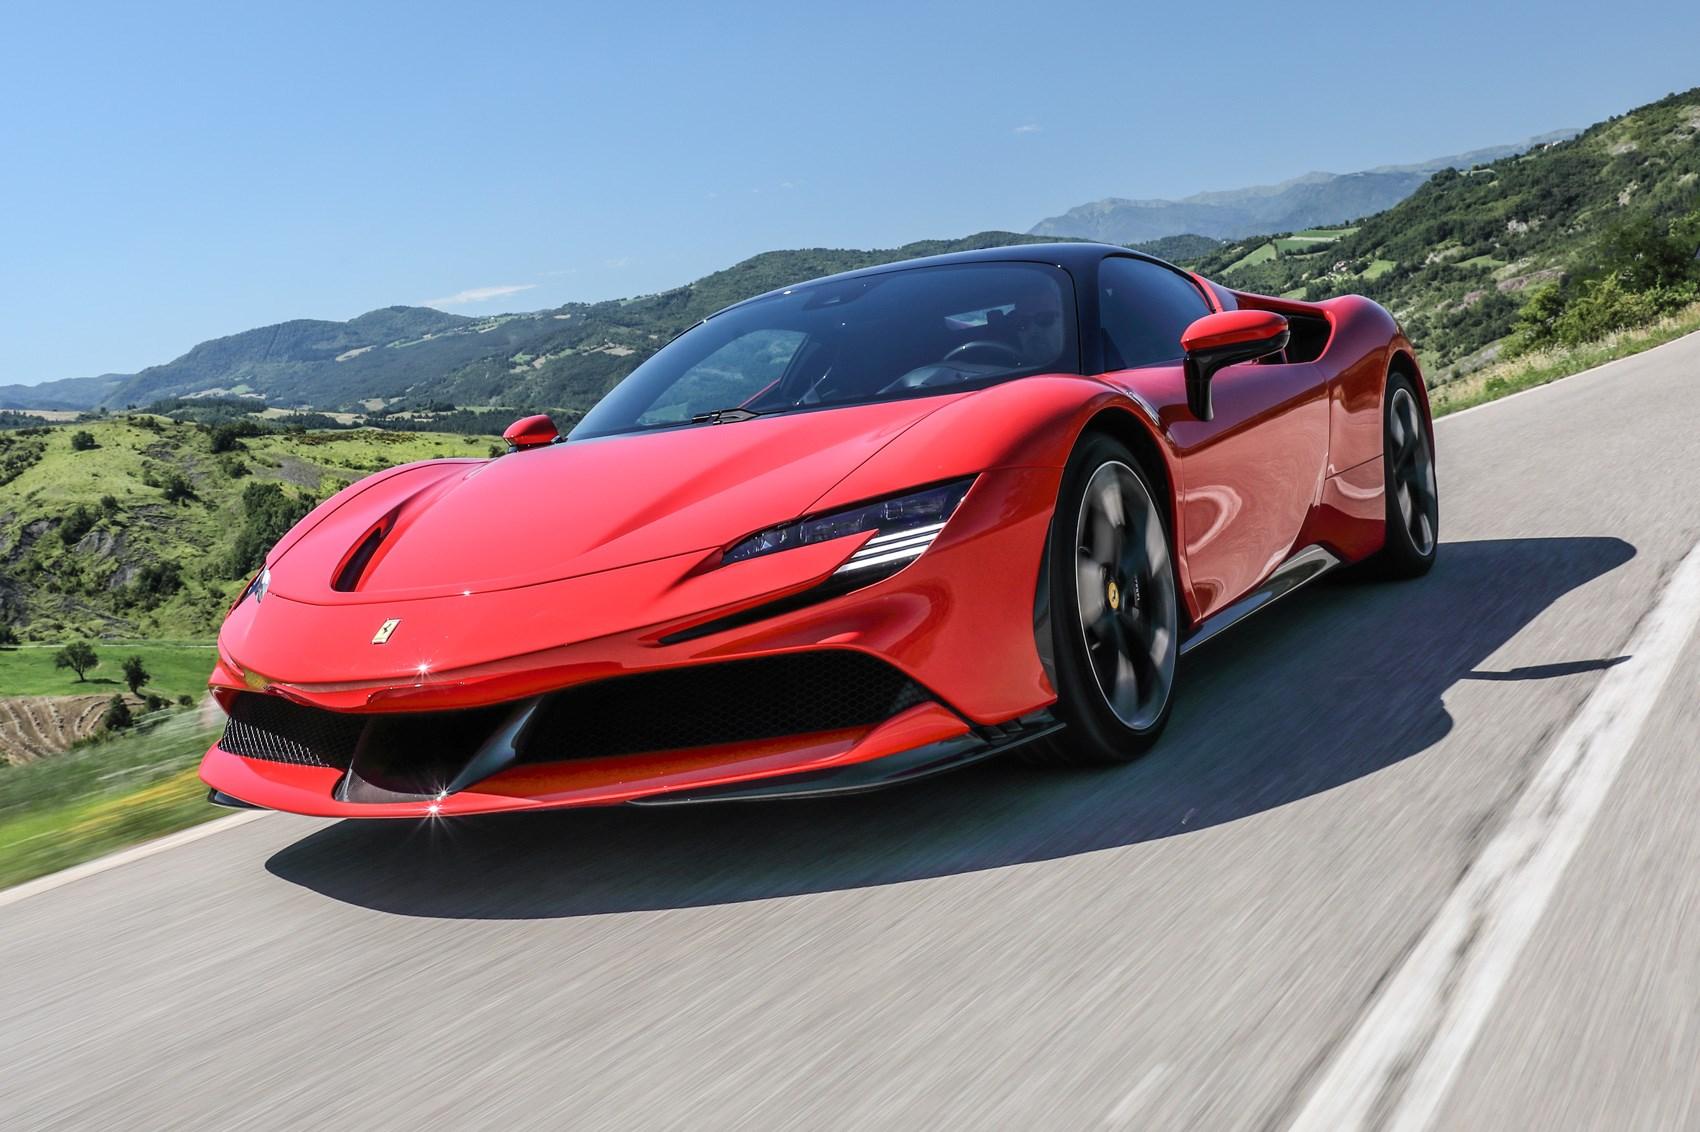 Ferrari Sf90 Stradale 2020 Review An Electrifying Performance Car Magazine